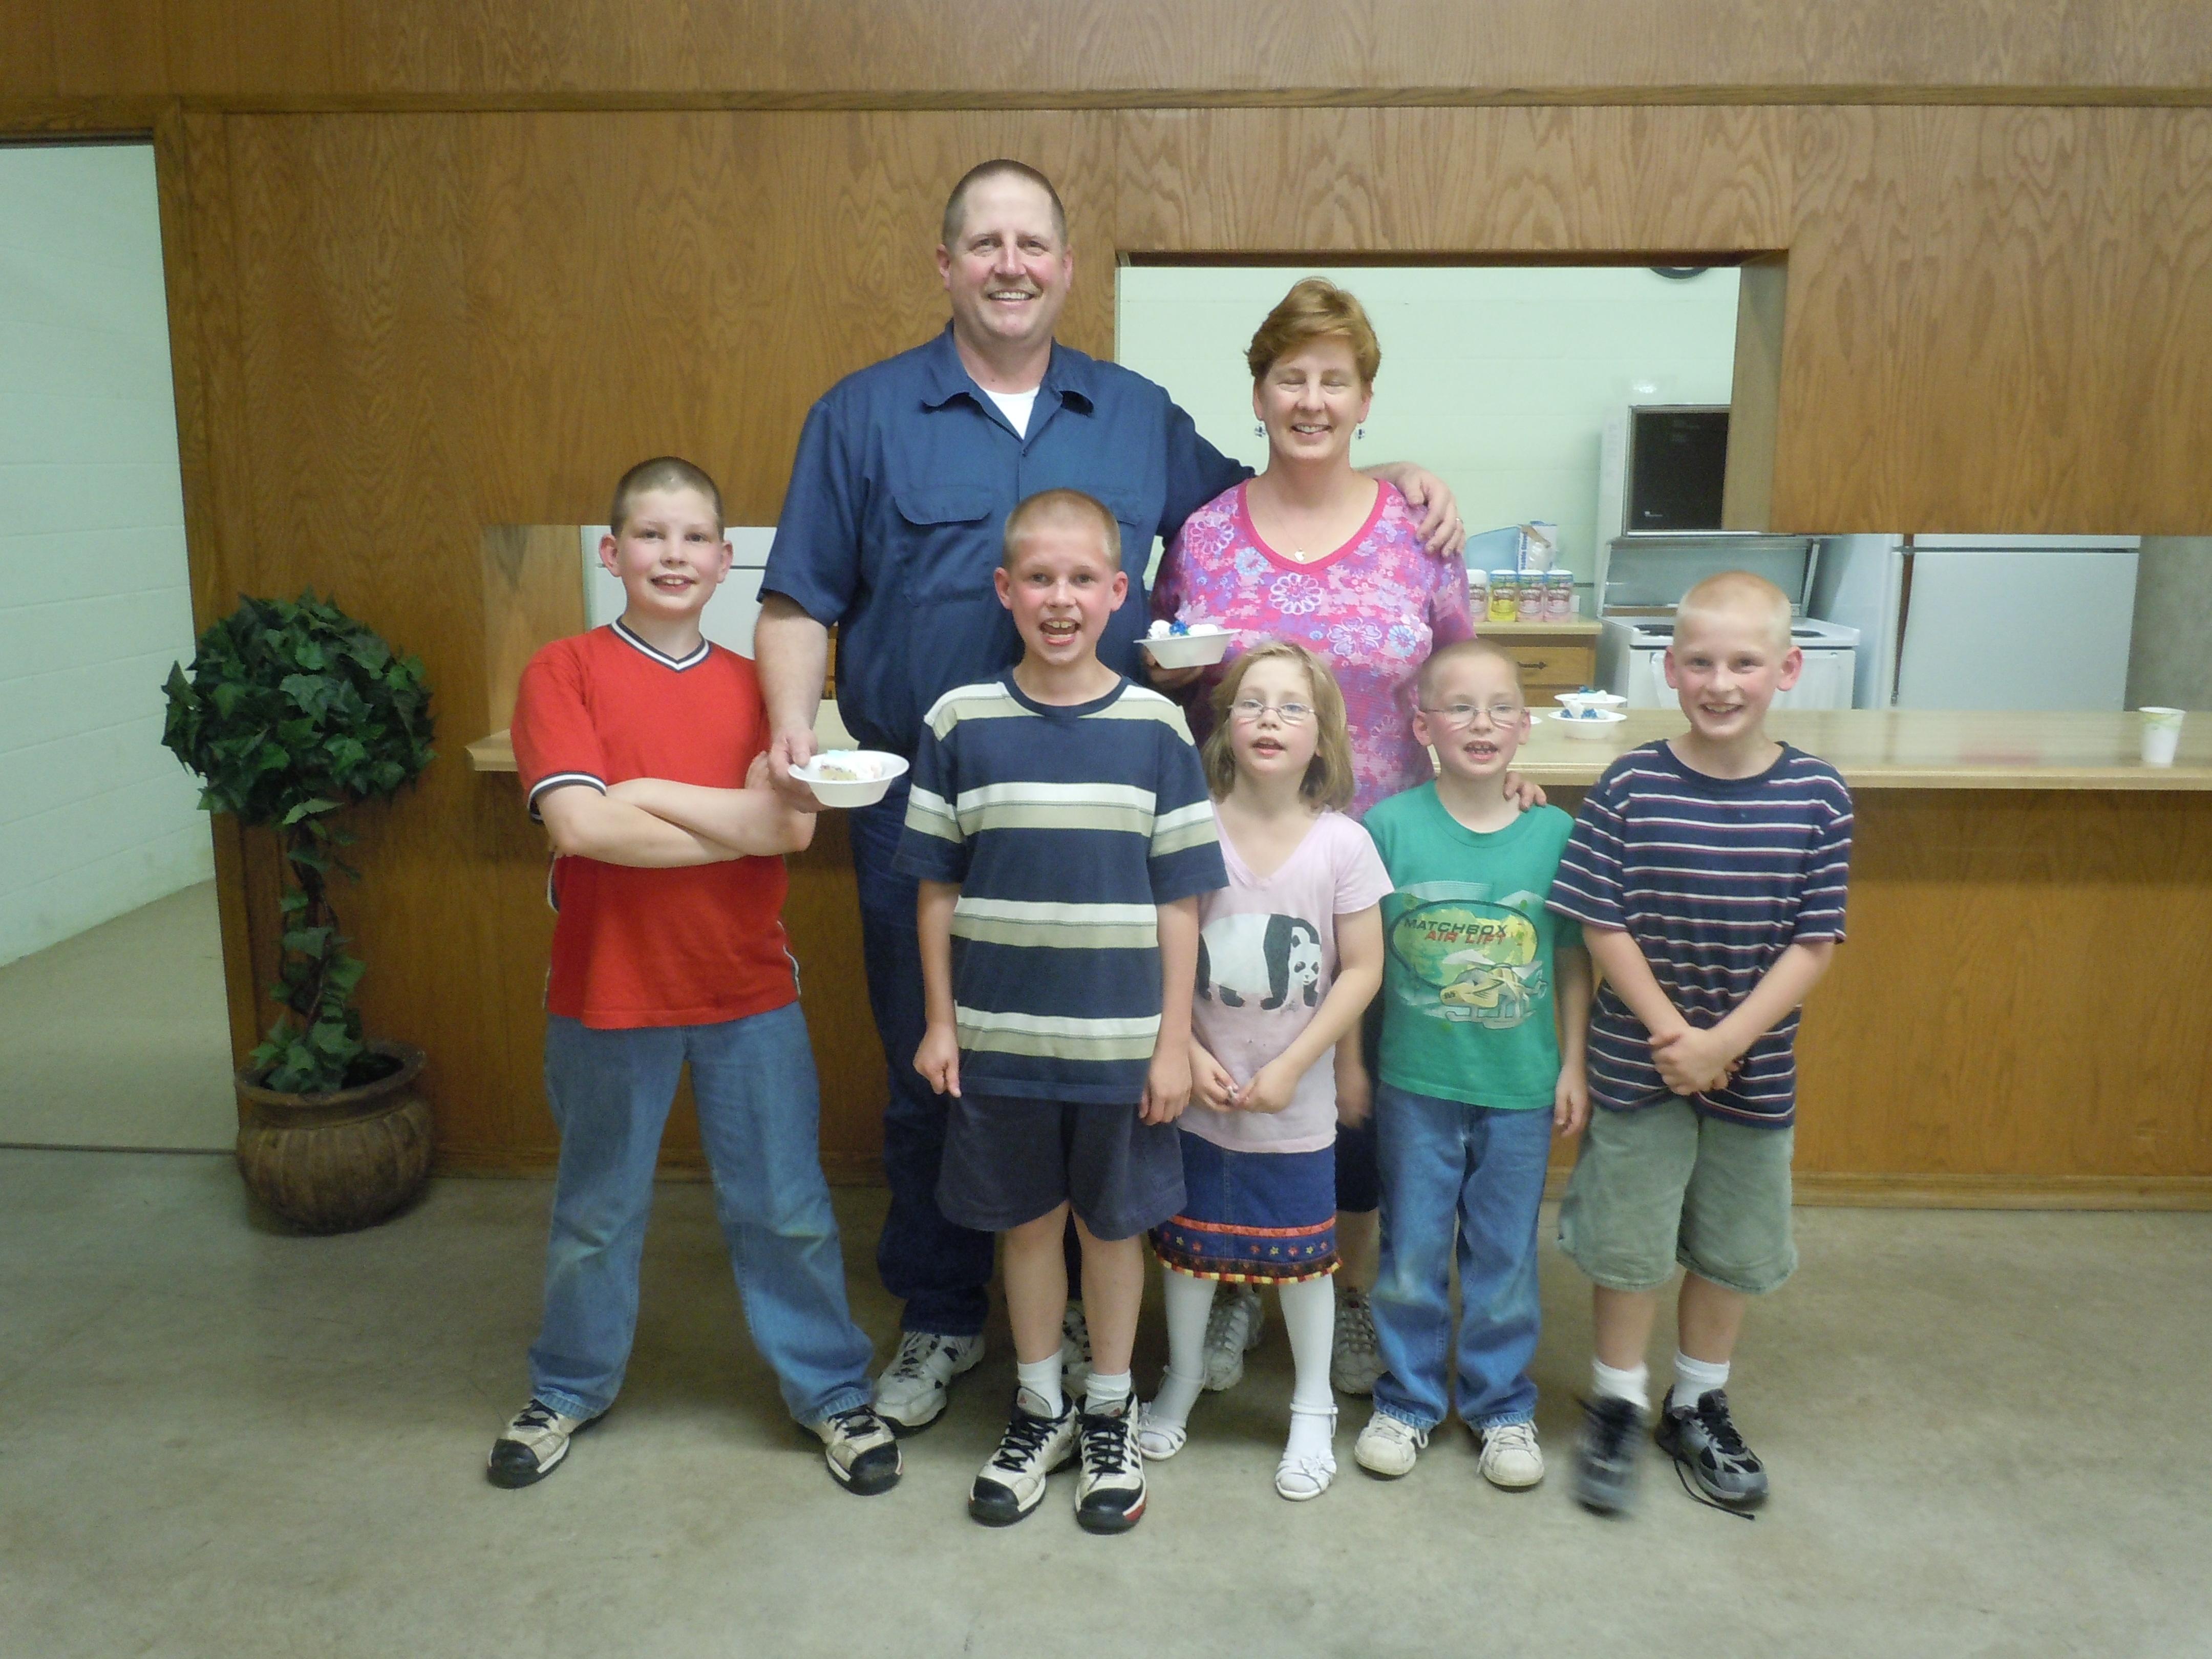 Jim & Brenda Emerson family